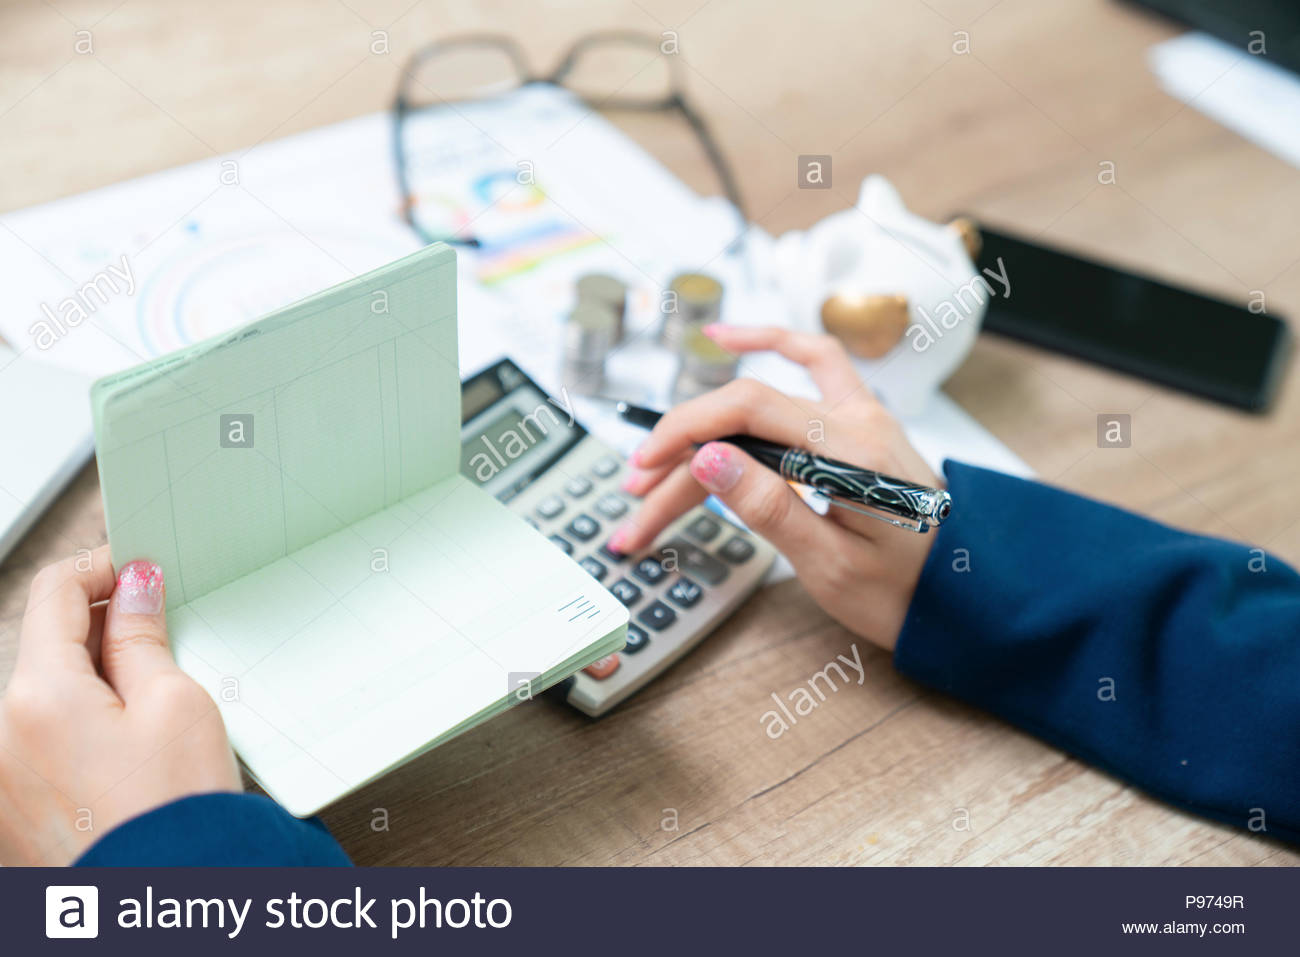 hands holding saving account passbook, - Stock Image